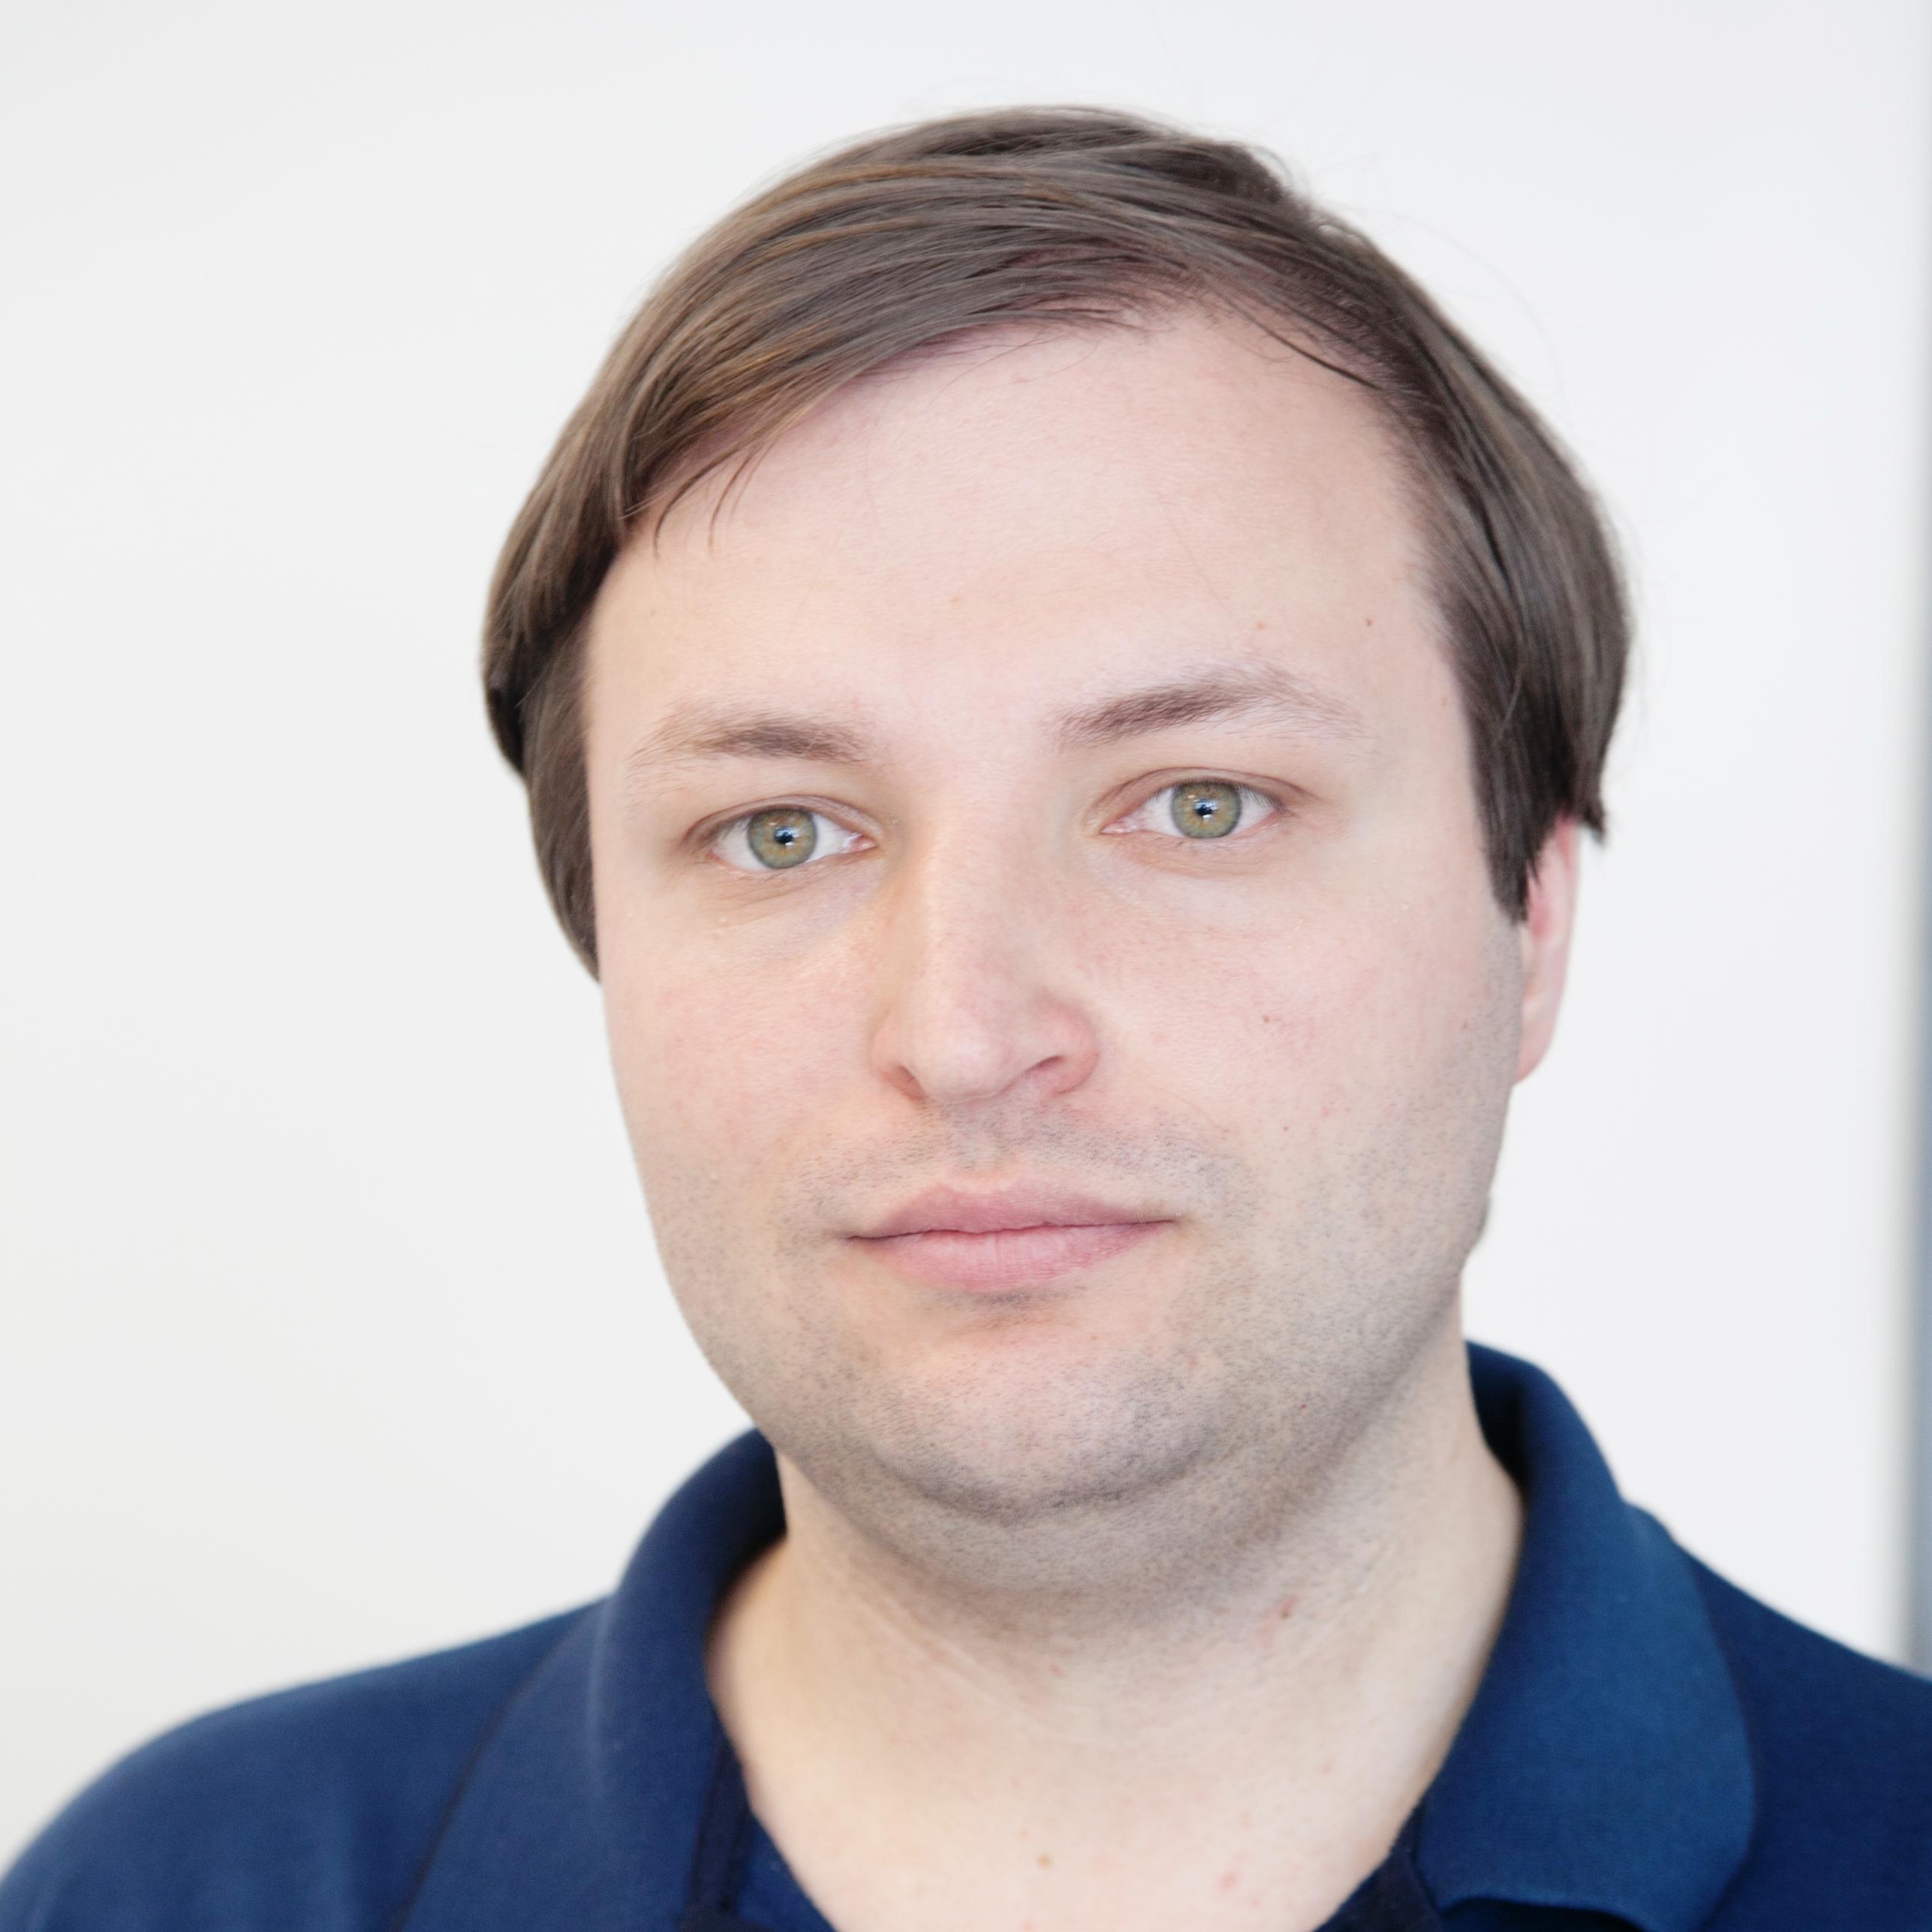 Veaceslav Jechiu